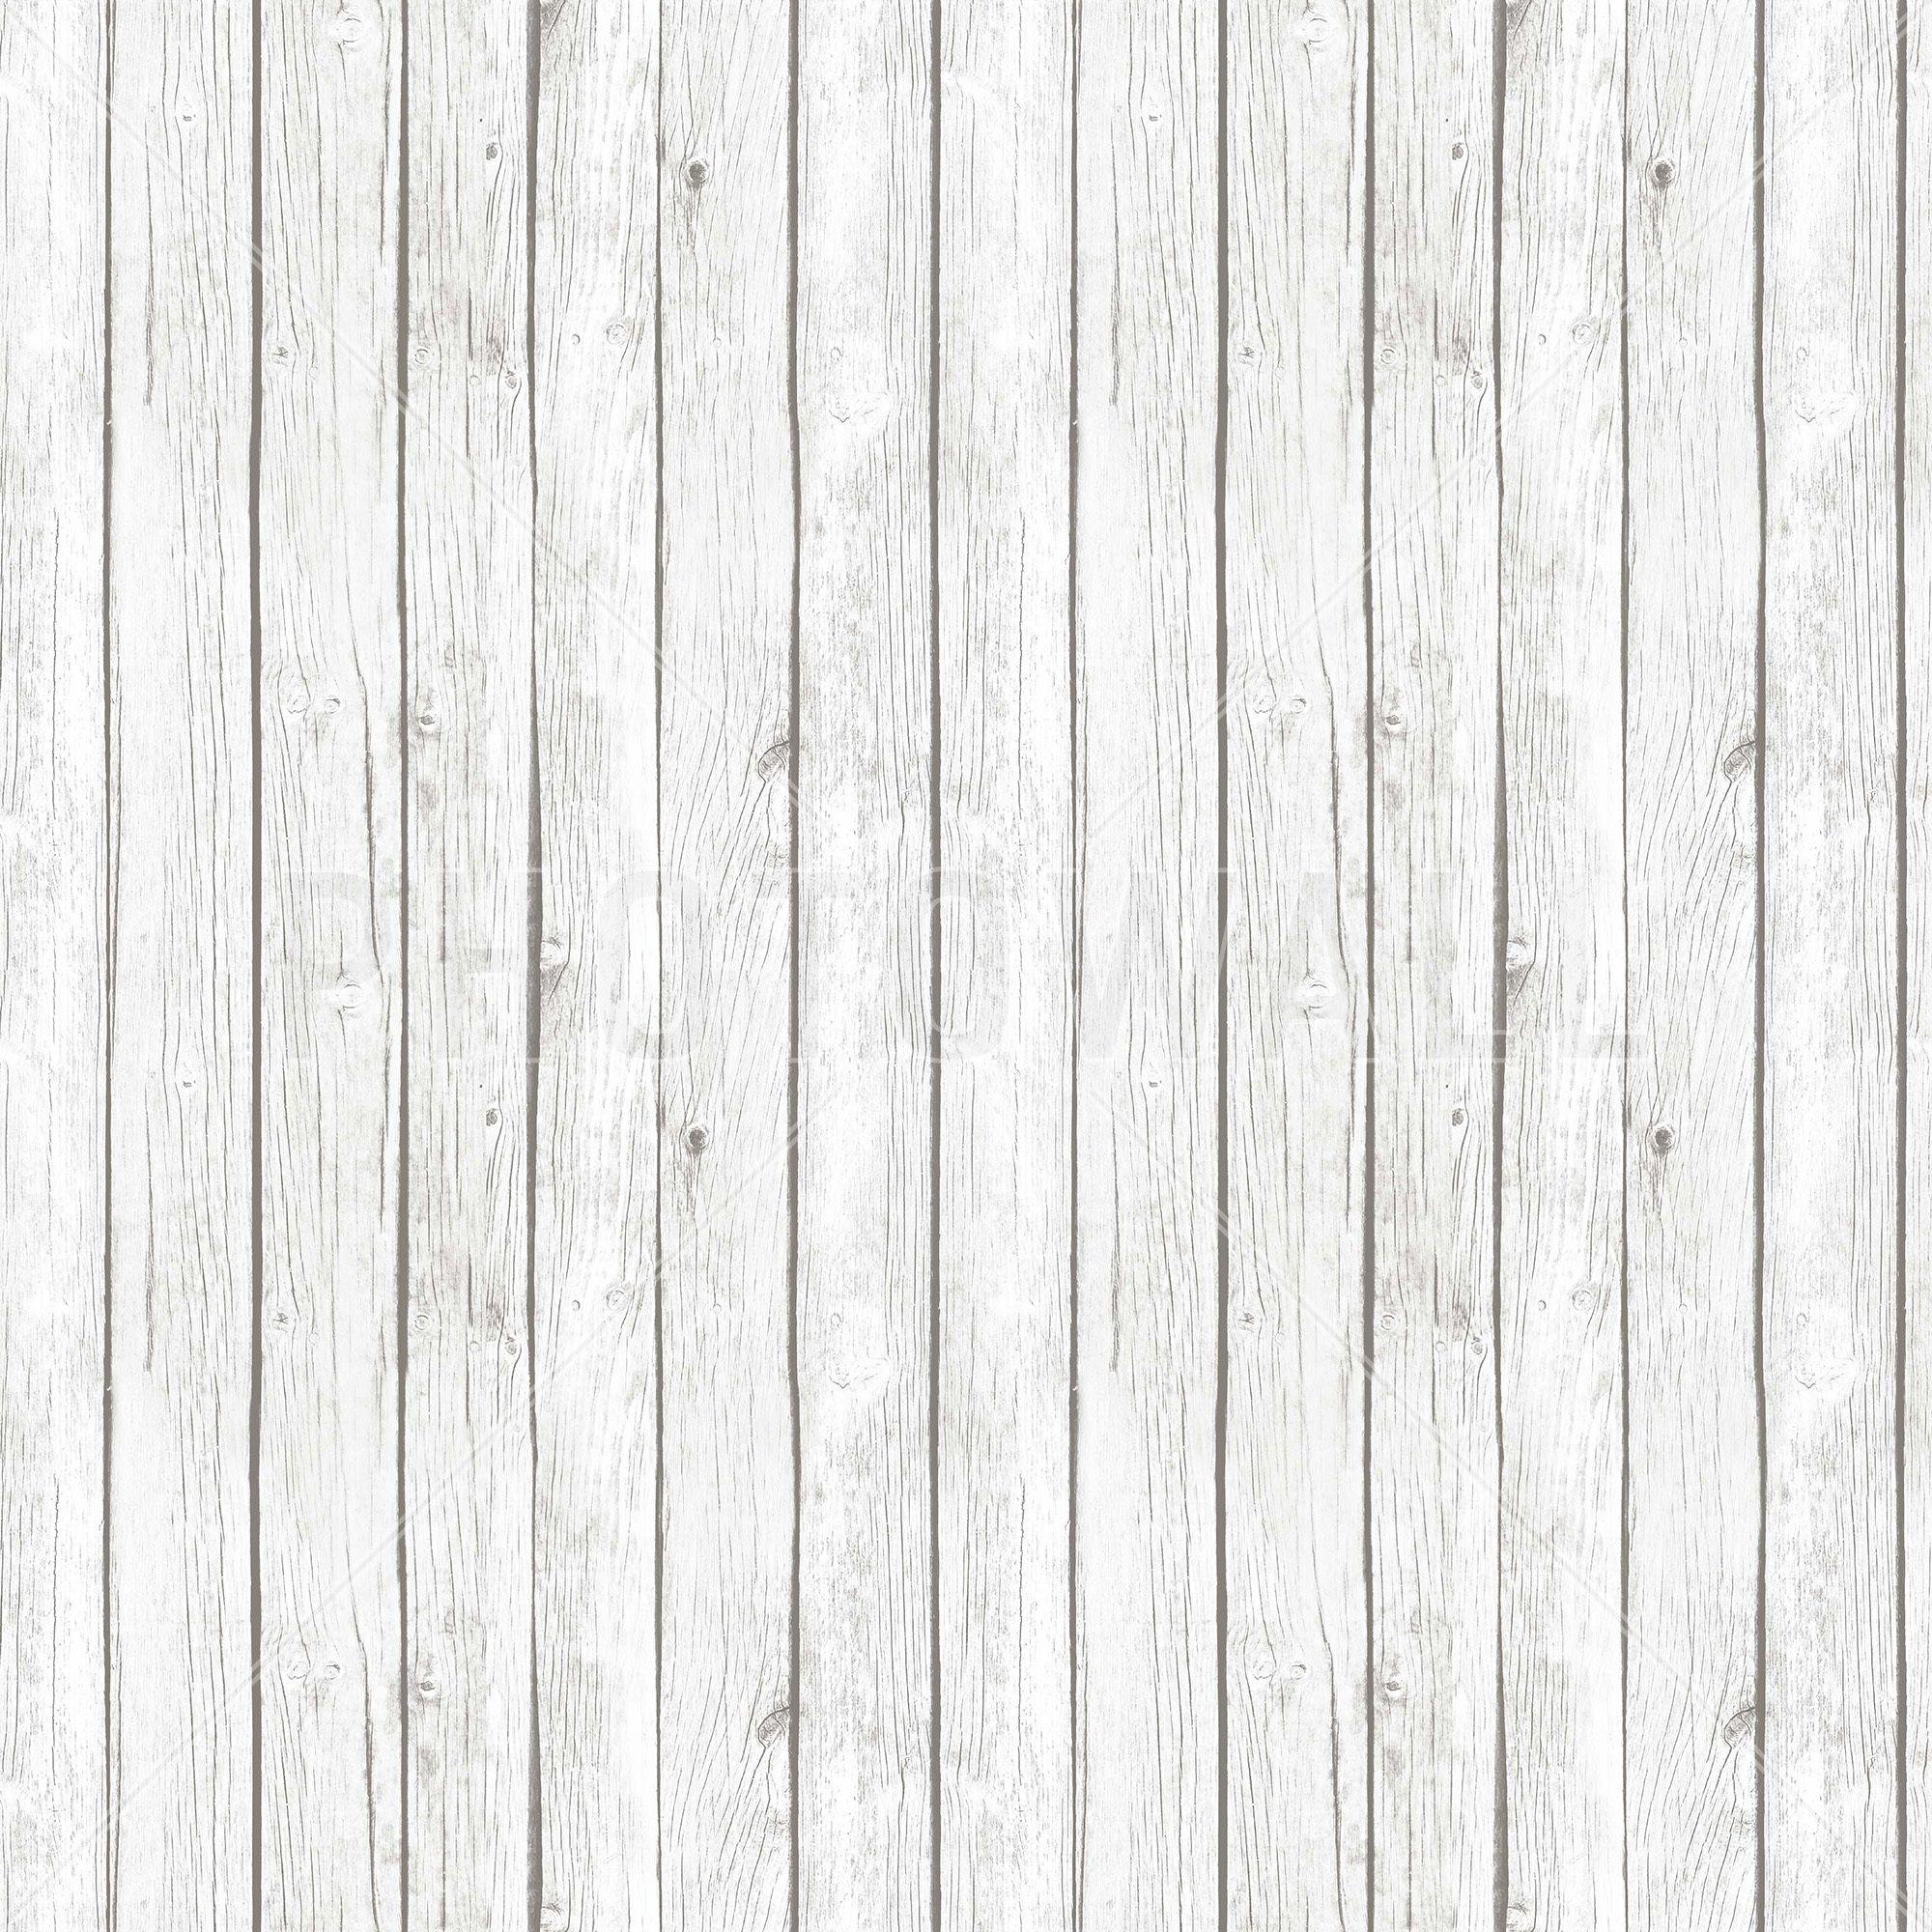 Board Wall - White - Fototapeter & Tapeter - Photowall